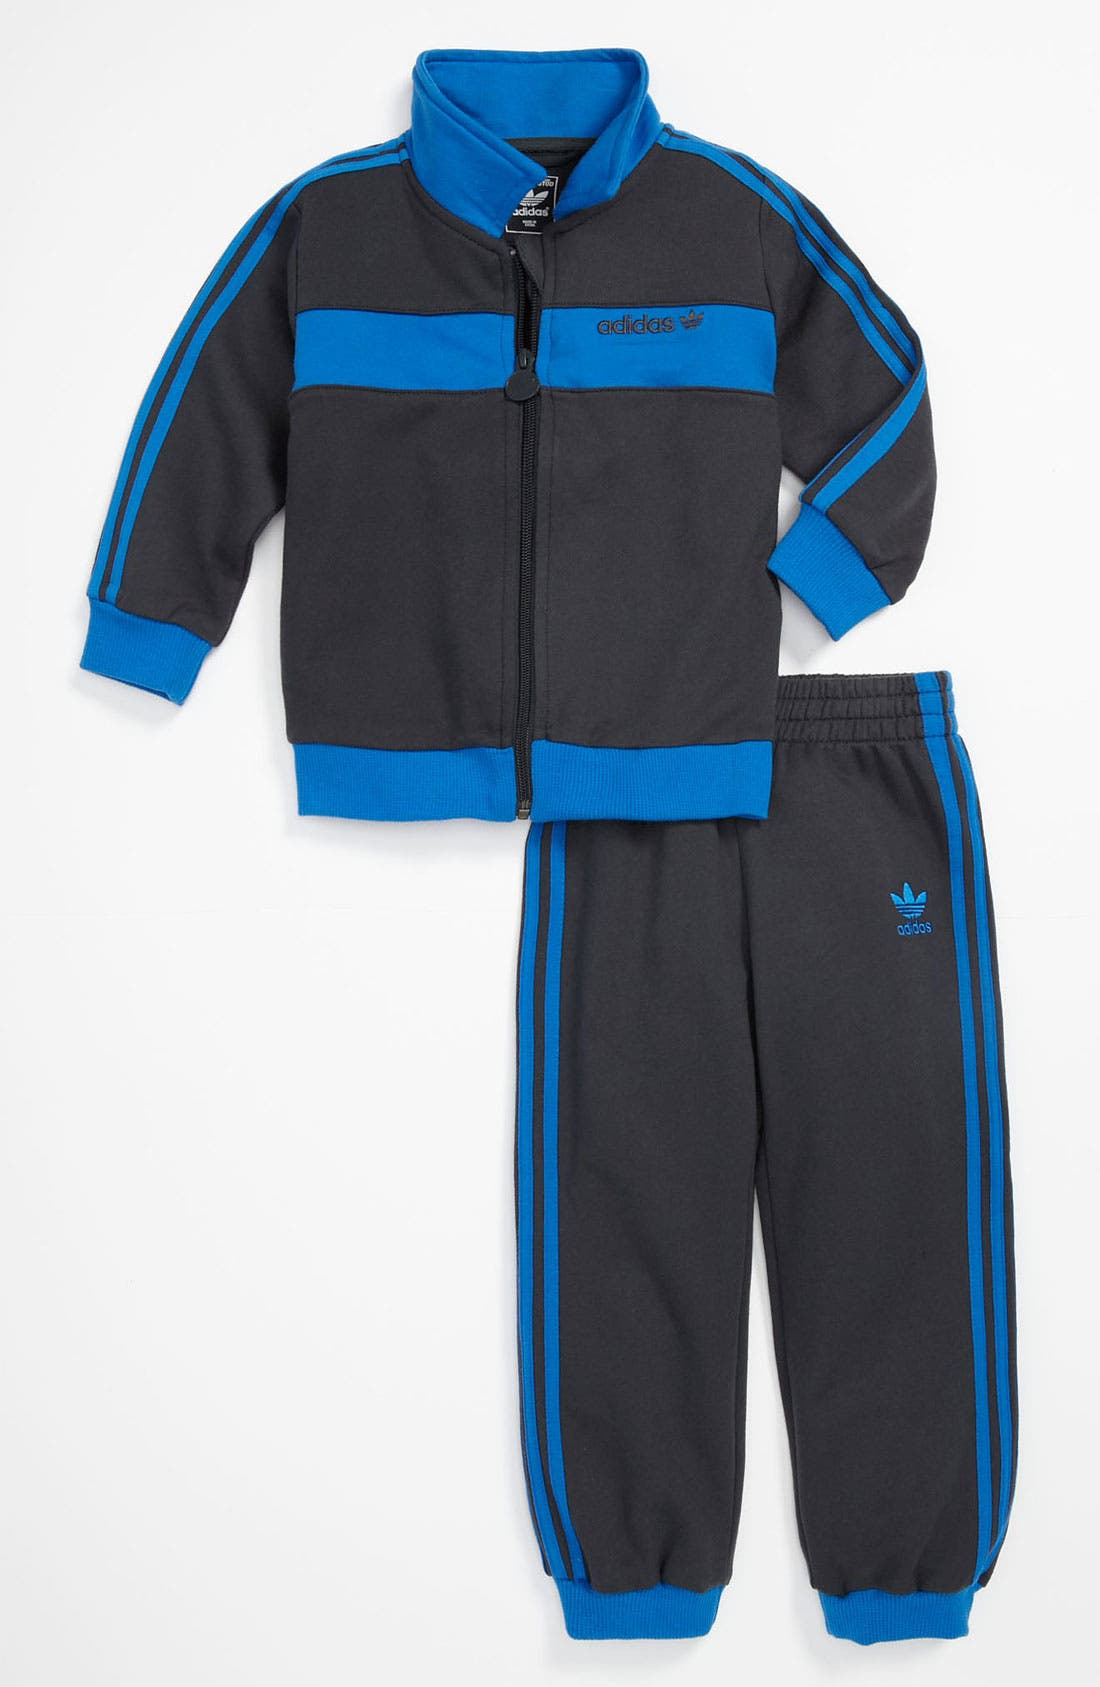 Alternate Image 1 Selected - adidas 'Breckenbauer' Jacket & Pants (Infant)